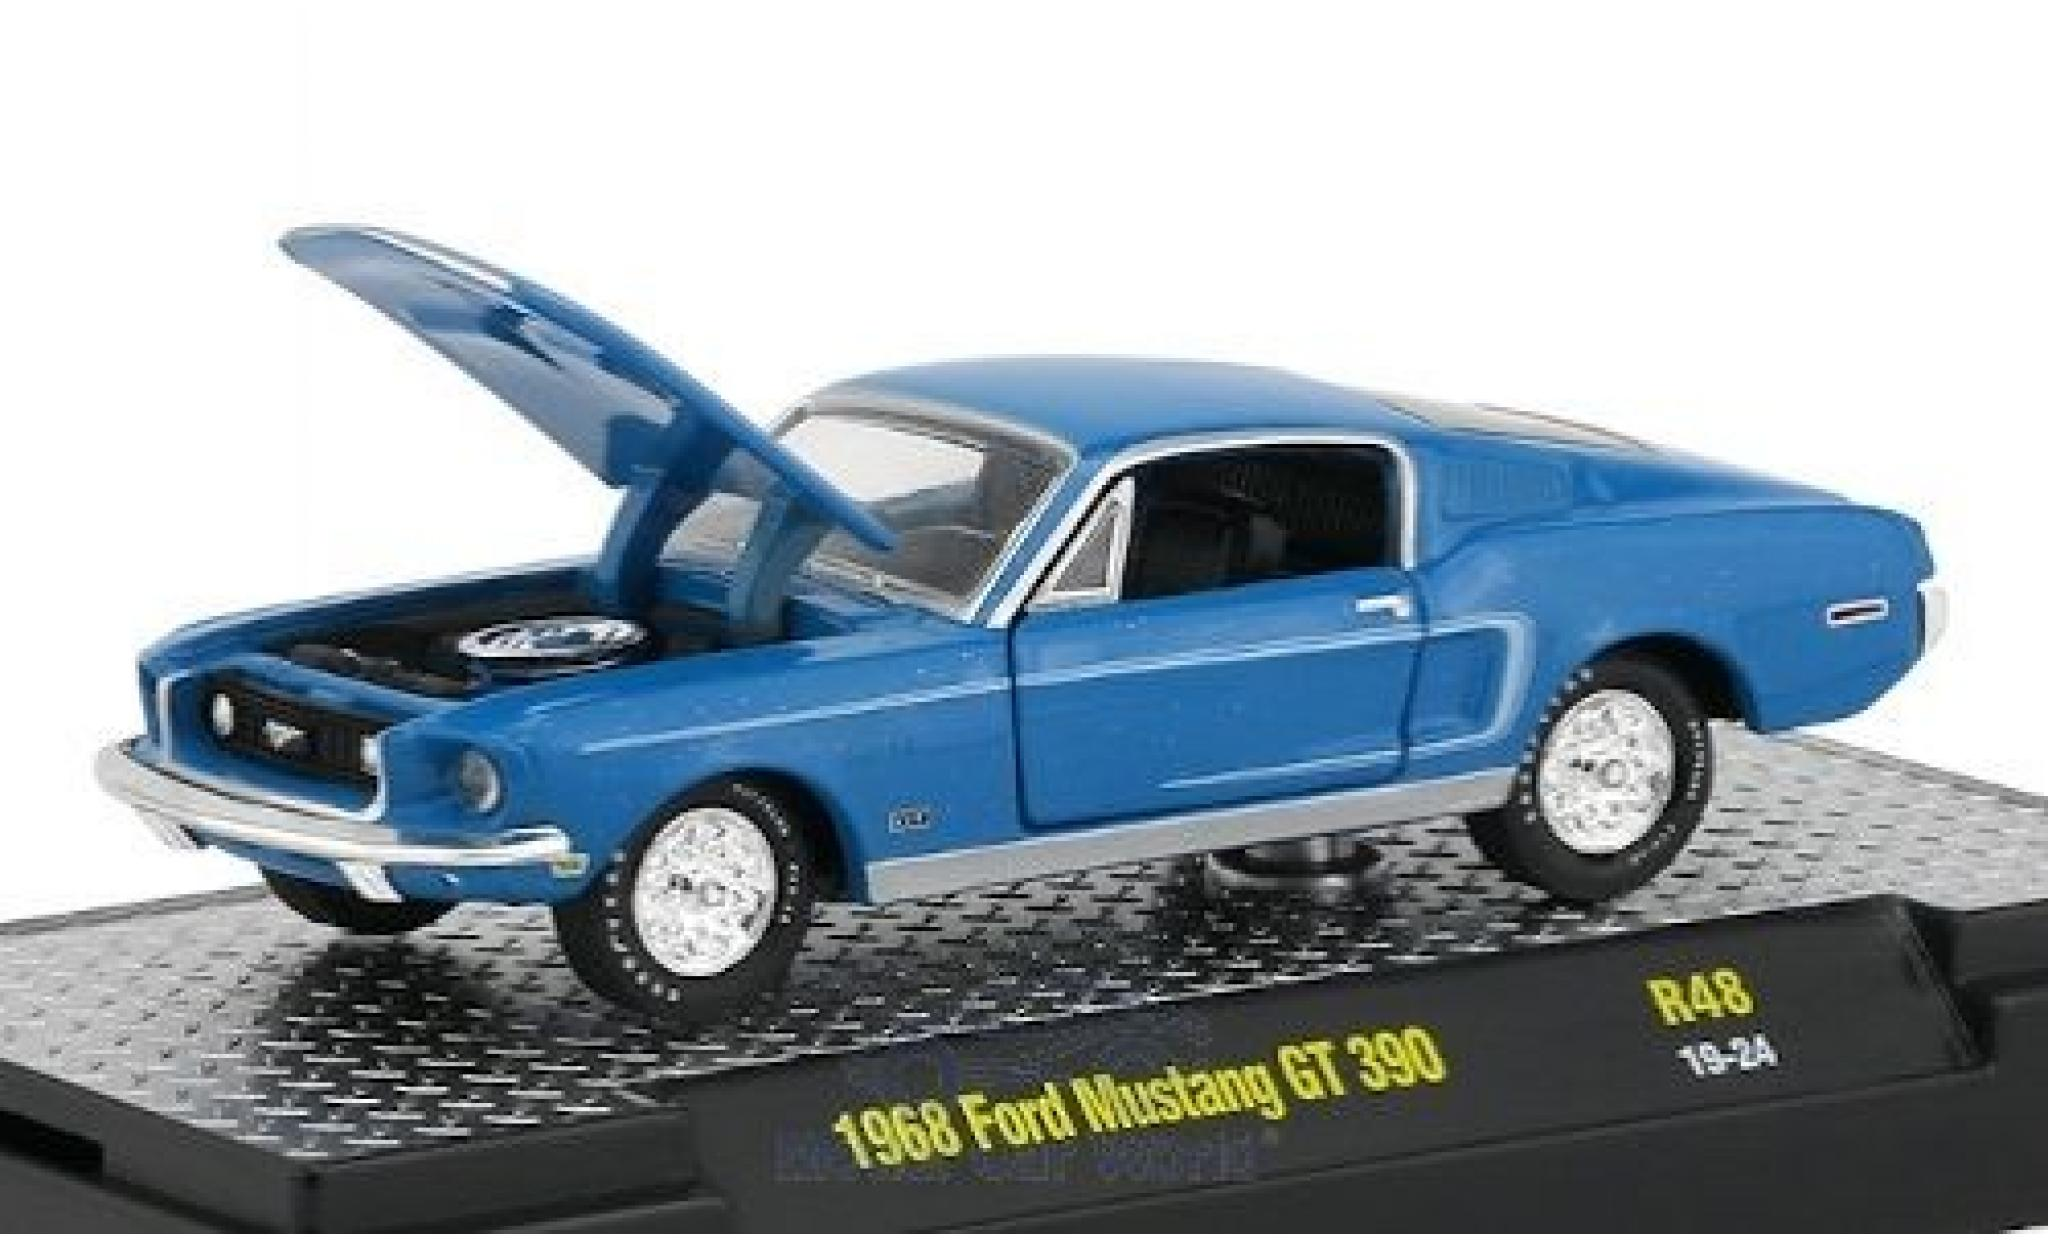 Ford Mustang I 2 génération GT Cobra Jet coupé jaune 1968 1//18 MAISTO Modèle A..